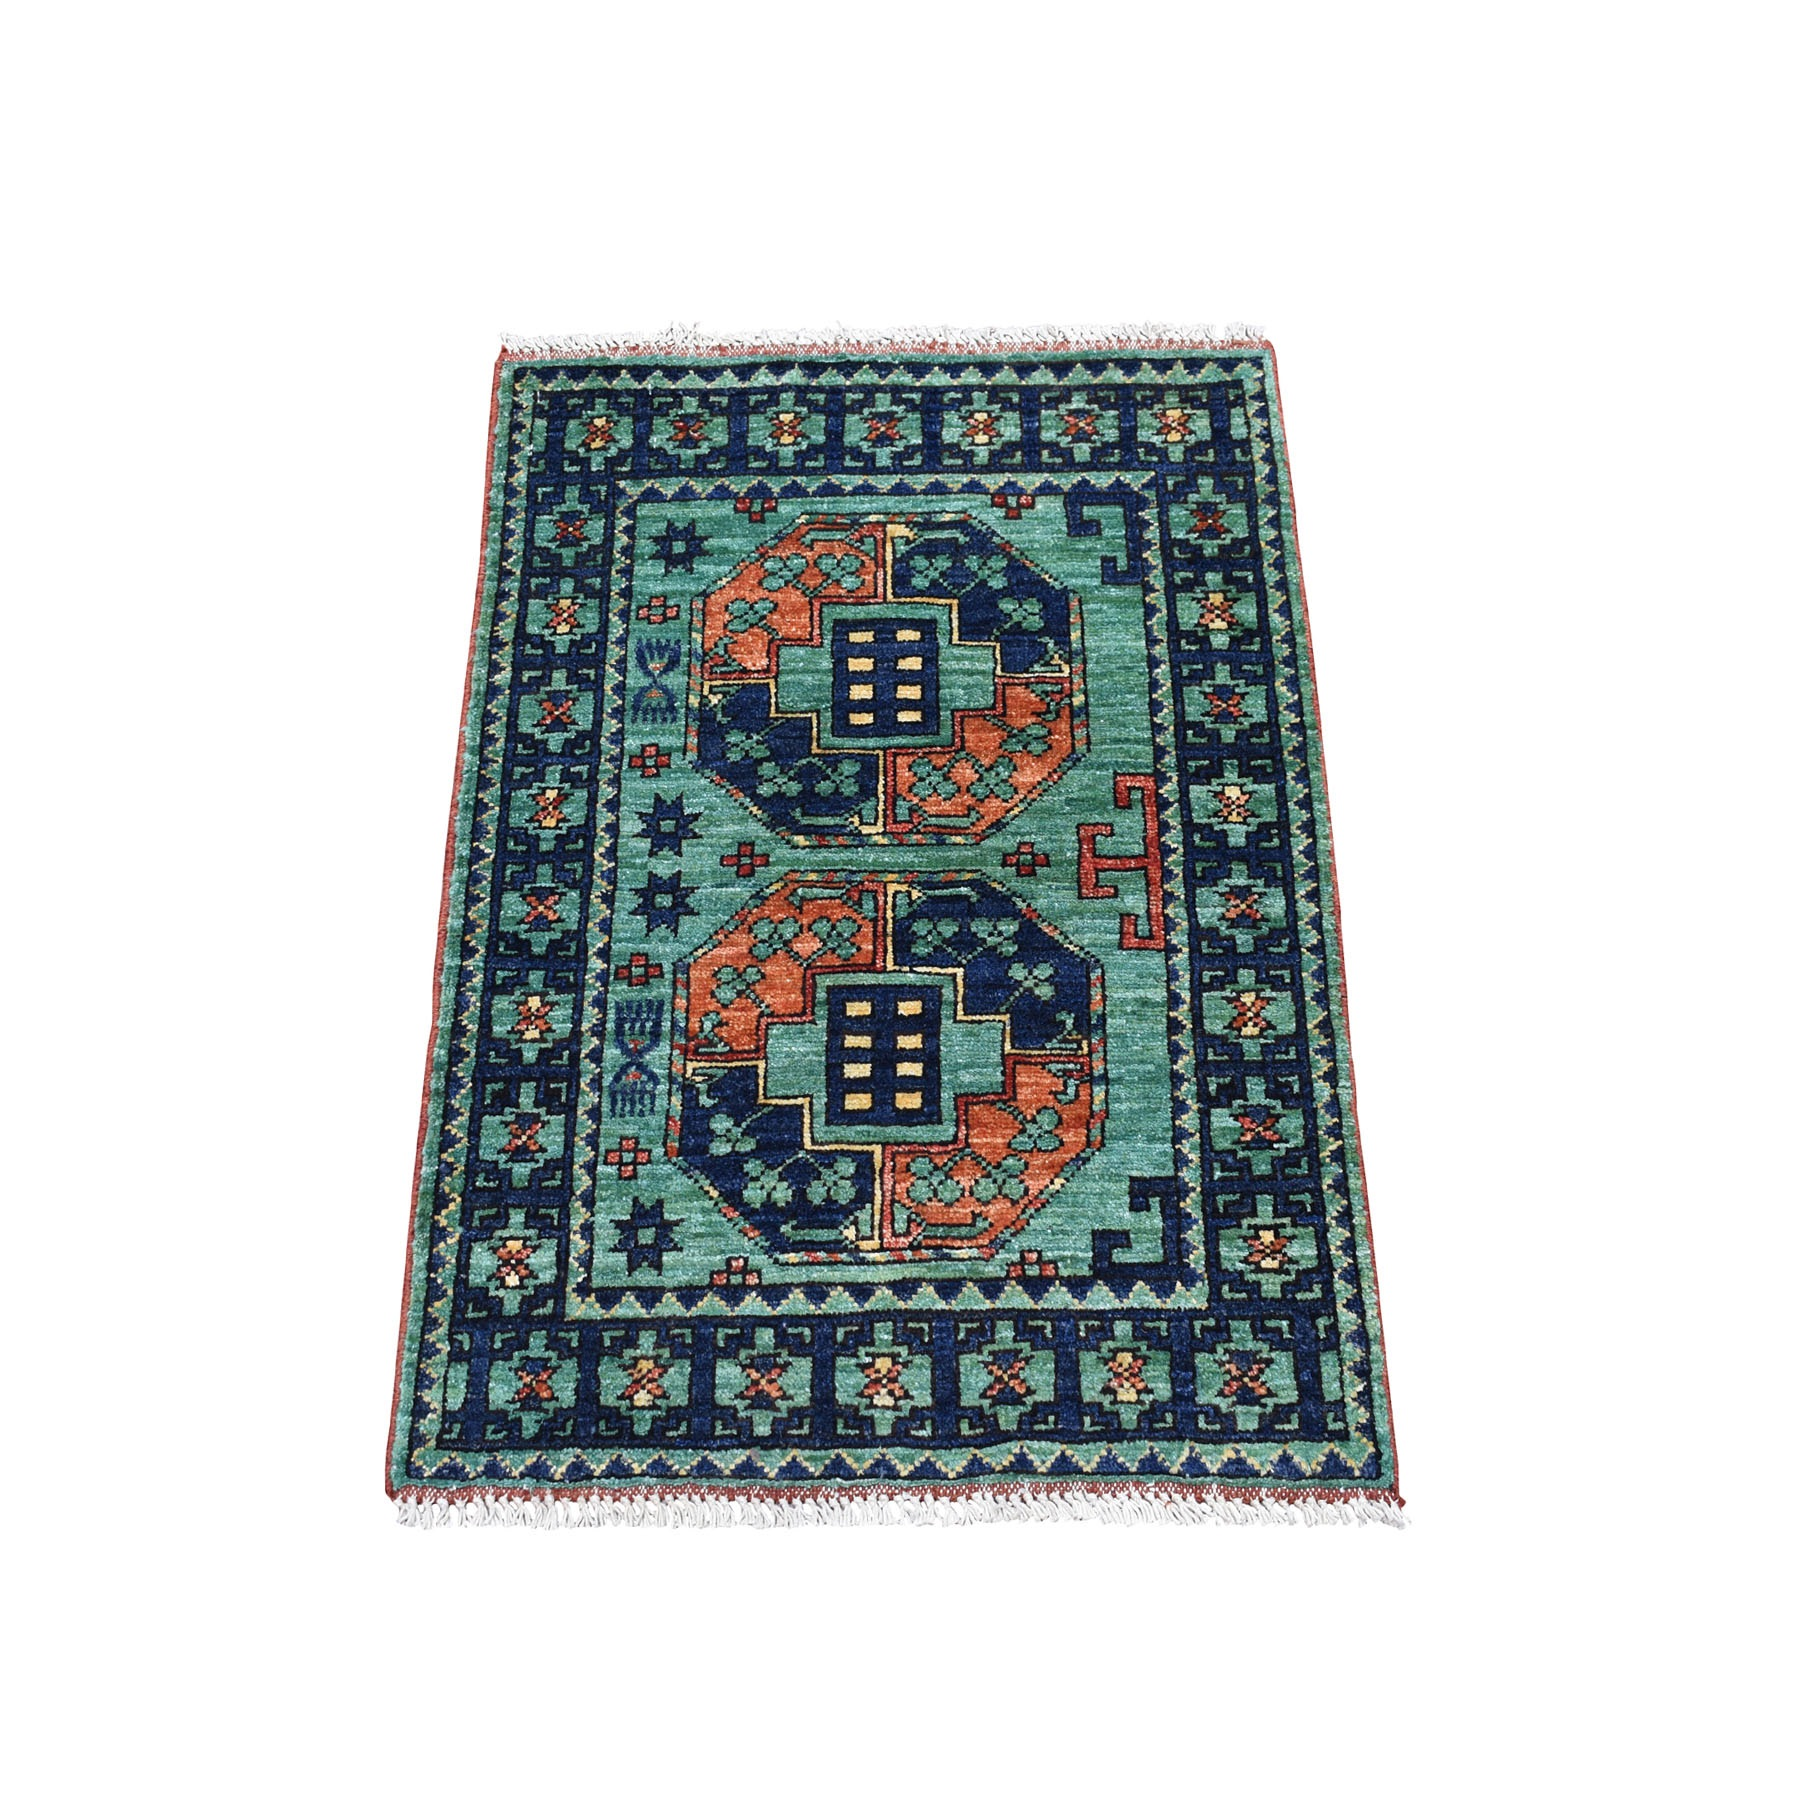 "2'x2'10"" Green Hand Knotted Afghan Ersari Elephant Feet Design Pure Wool Oriental Rug 53258"